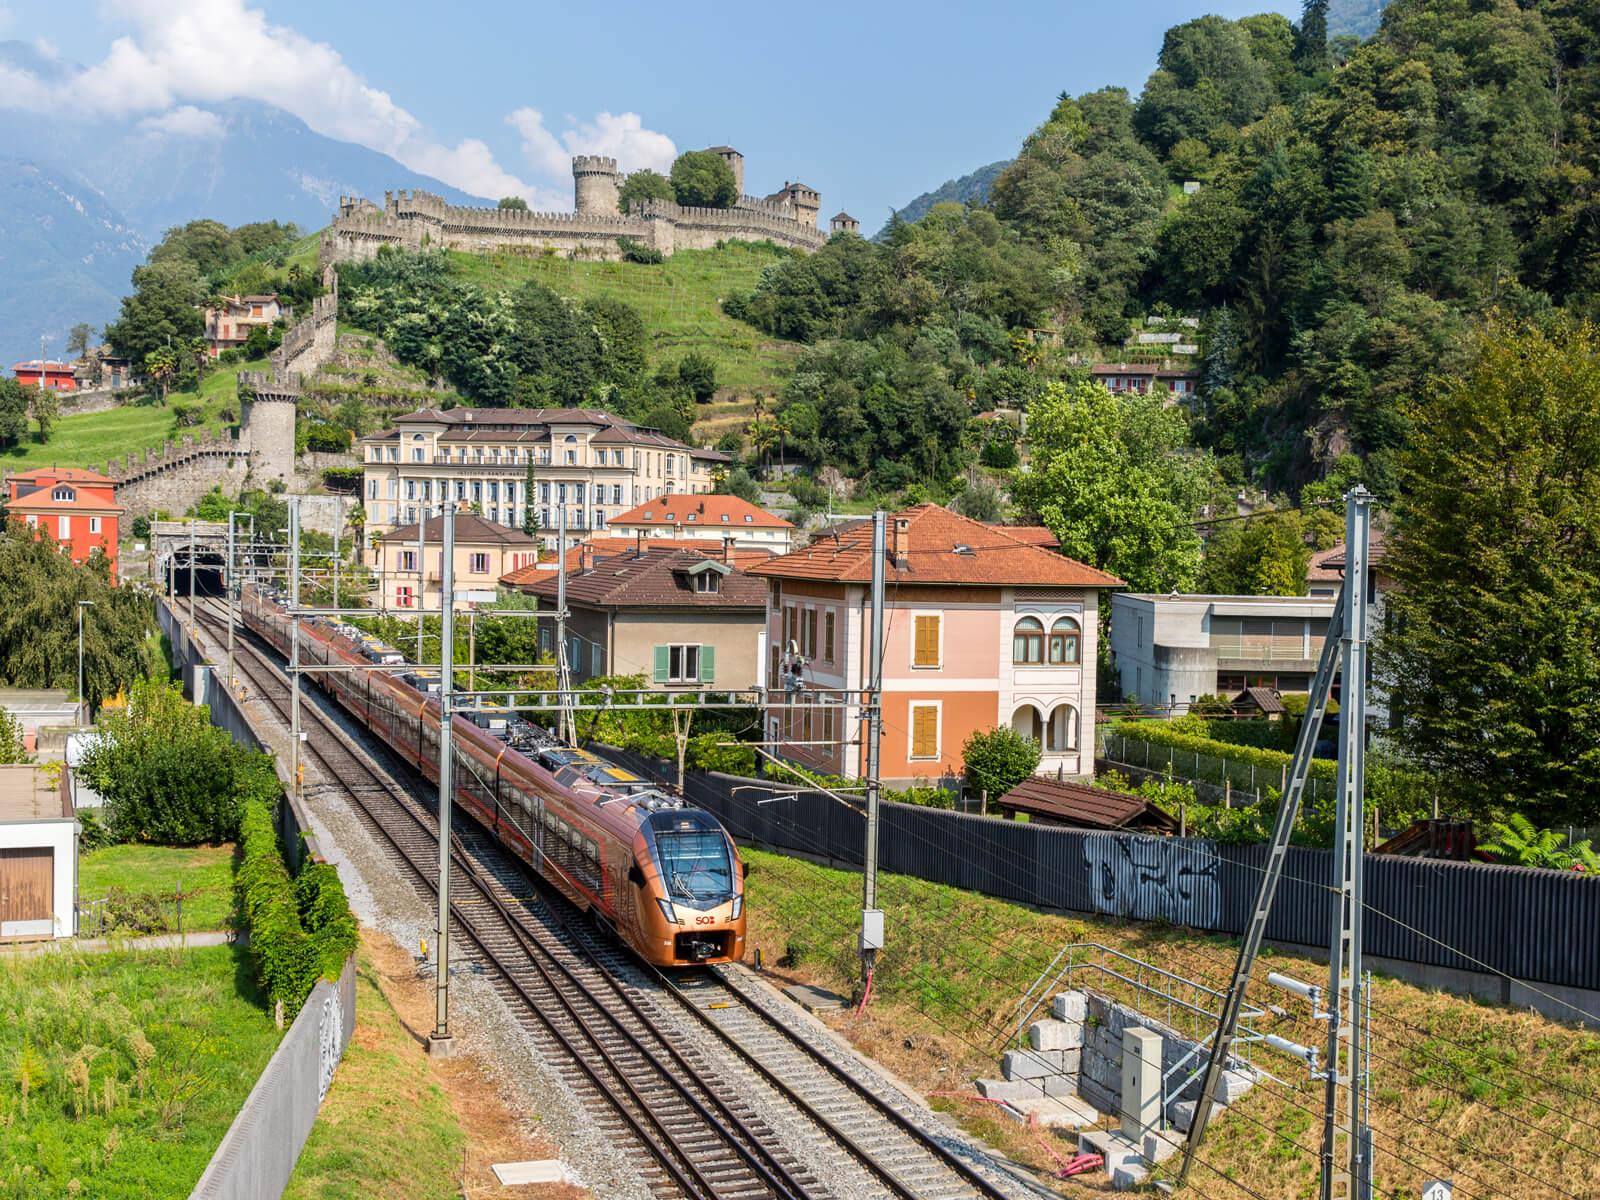 Treno Gottardo in Bellinzona (Copyright Markus Schälli/Ticino Turismo)